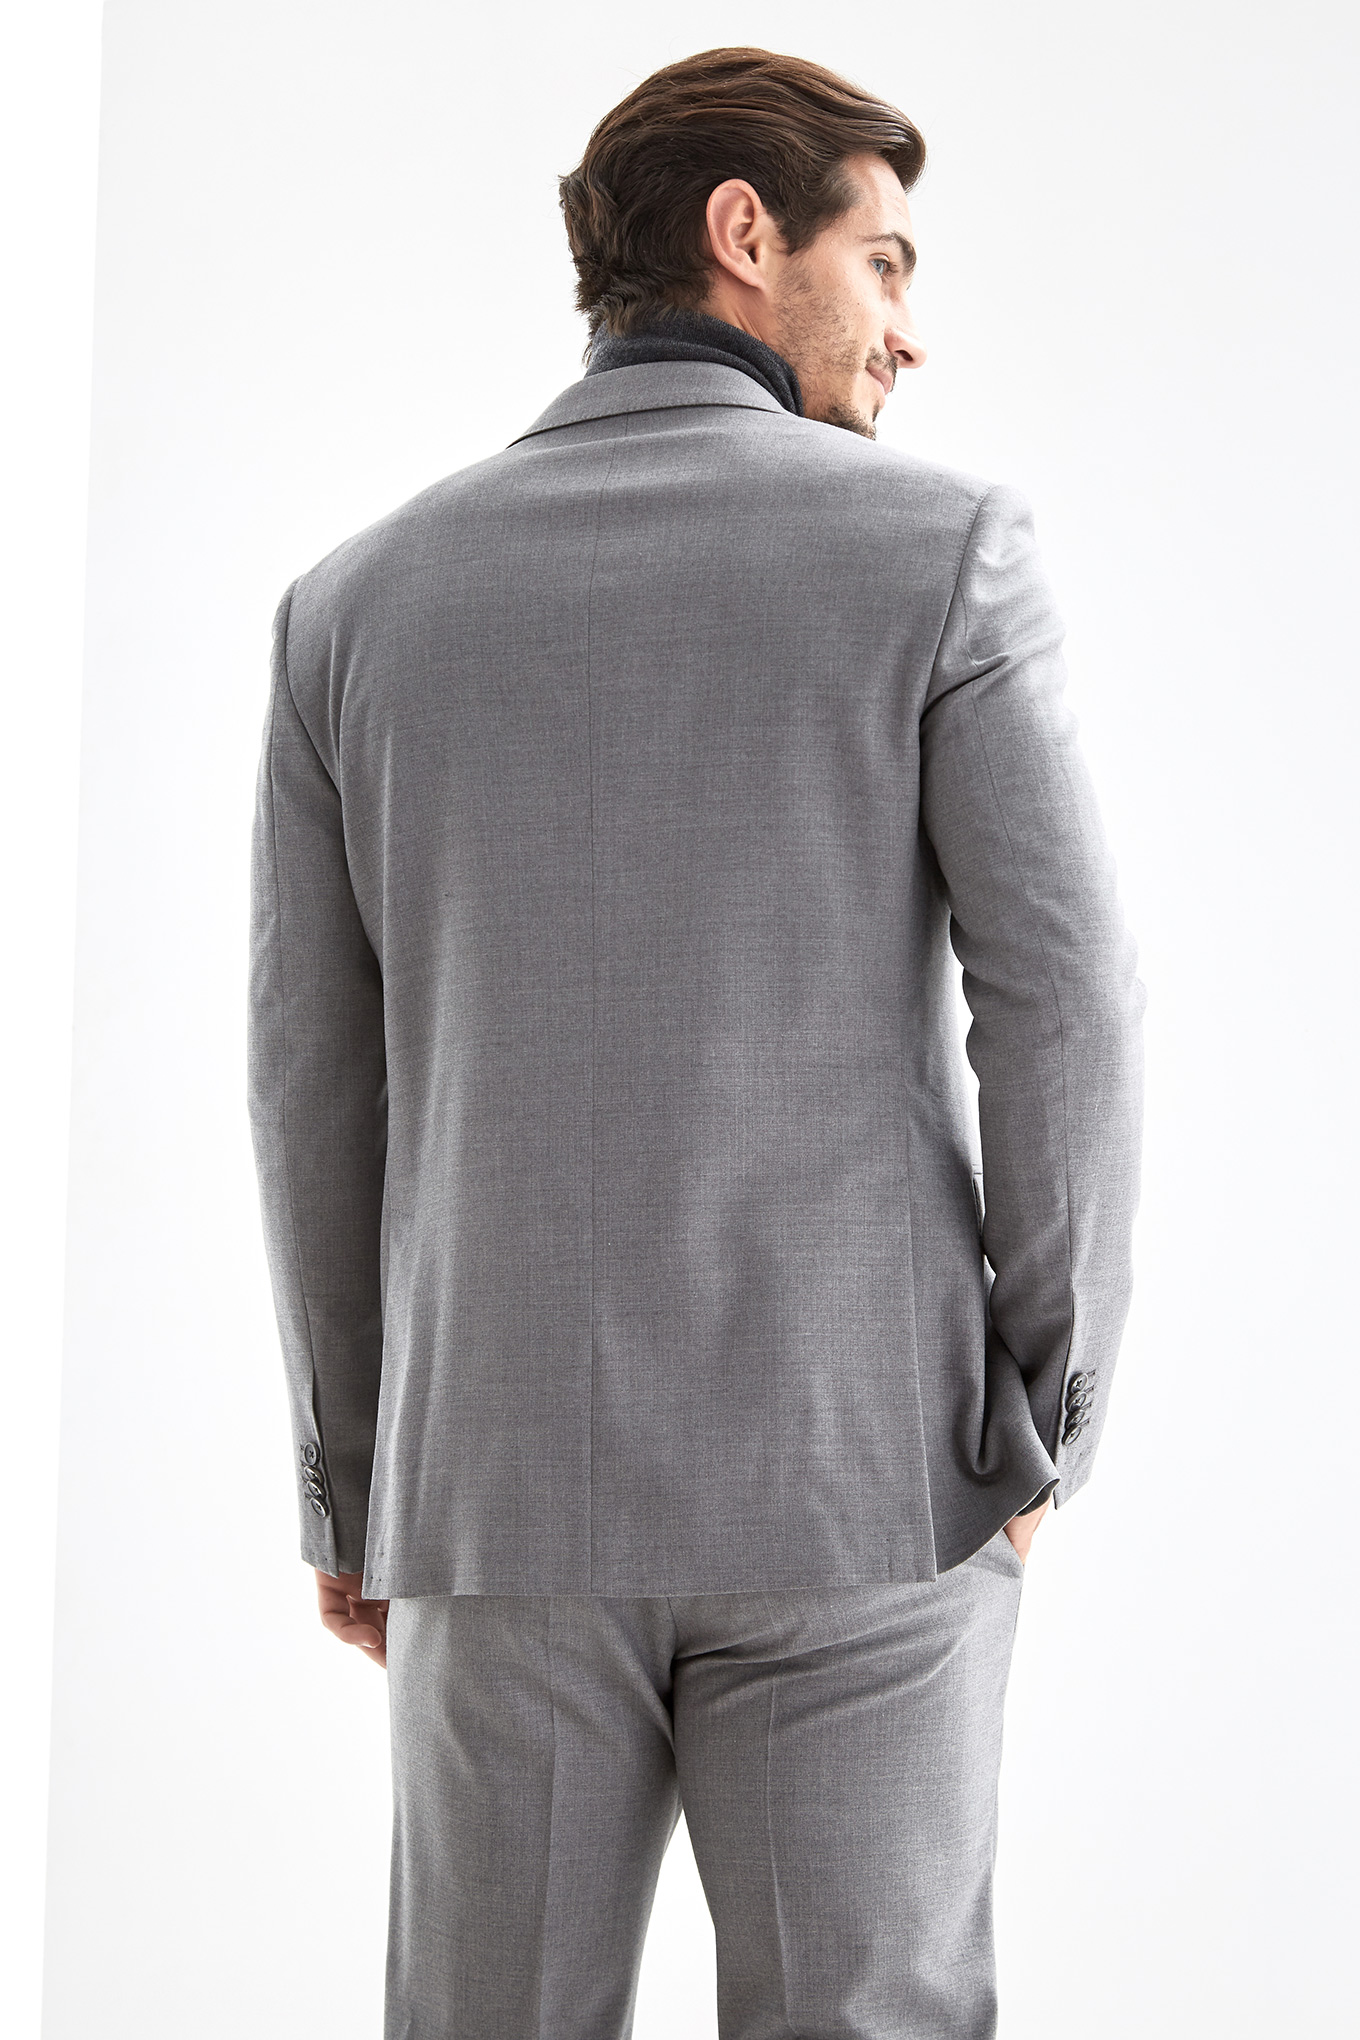 Suit Grey Classic Man